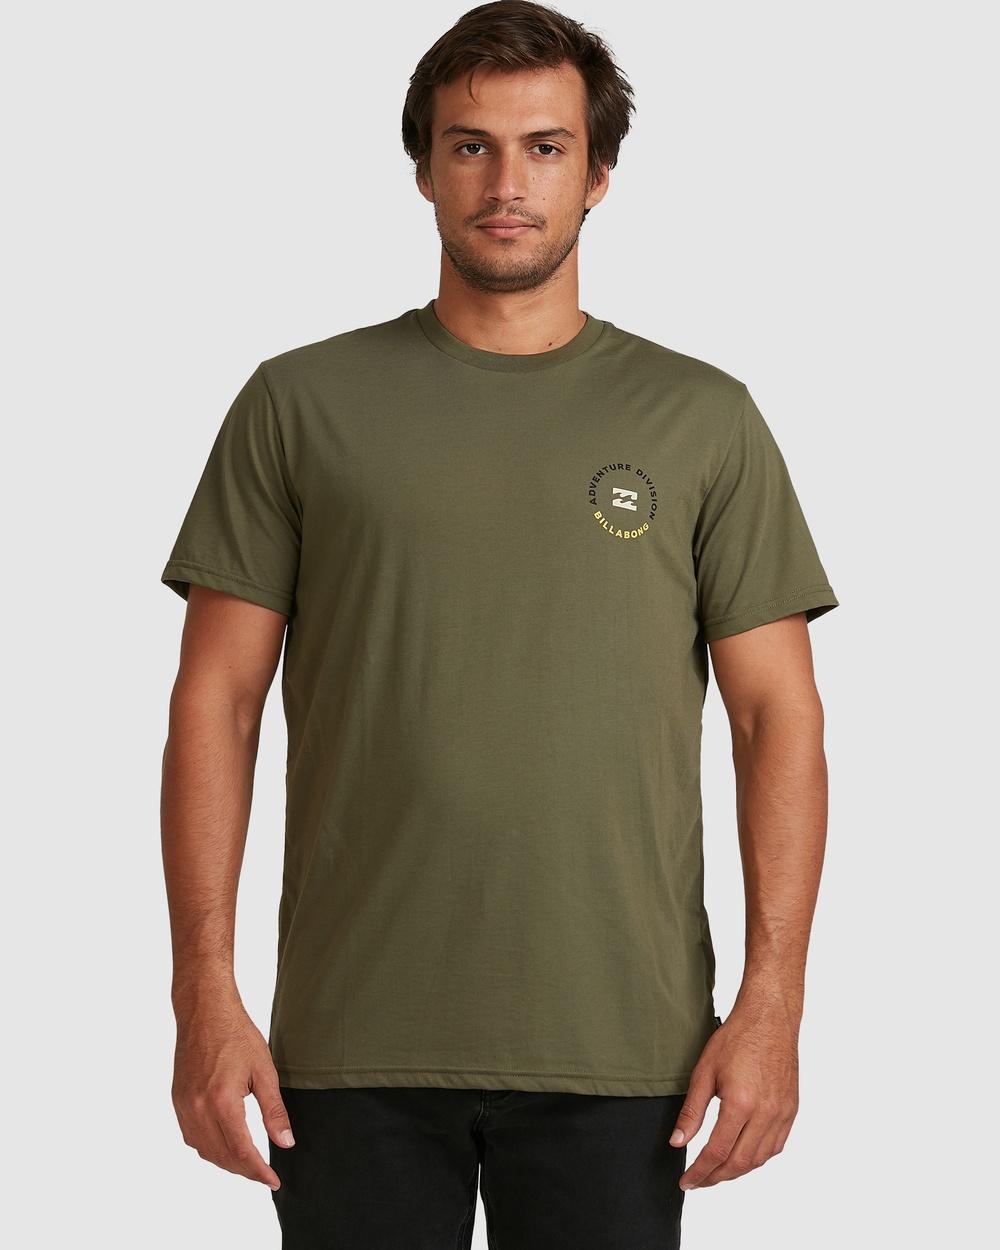 Billabong - Adiv View Tee - T-Shirts & Singlets (MILITARY) Adiv View Tee